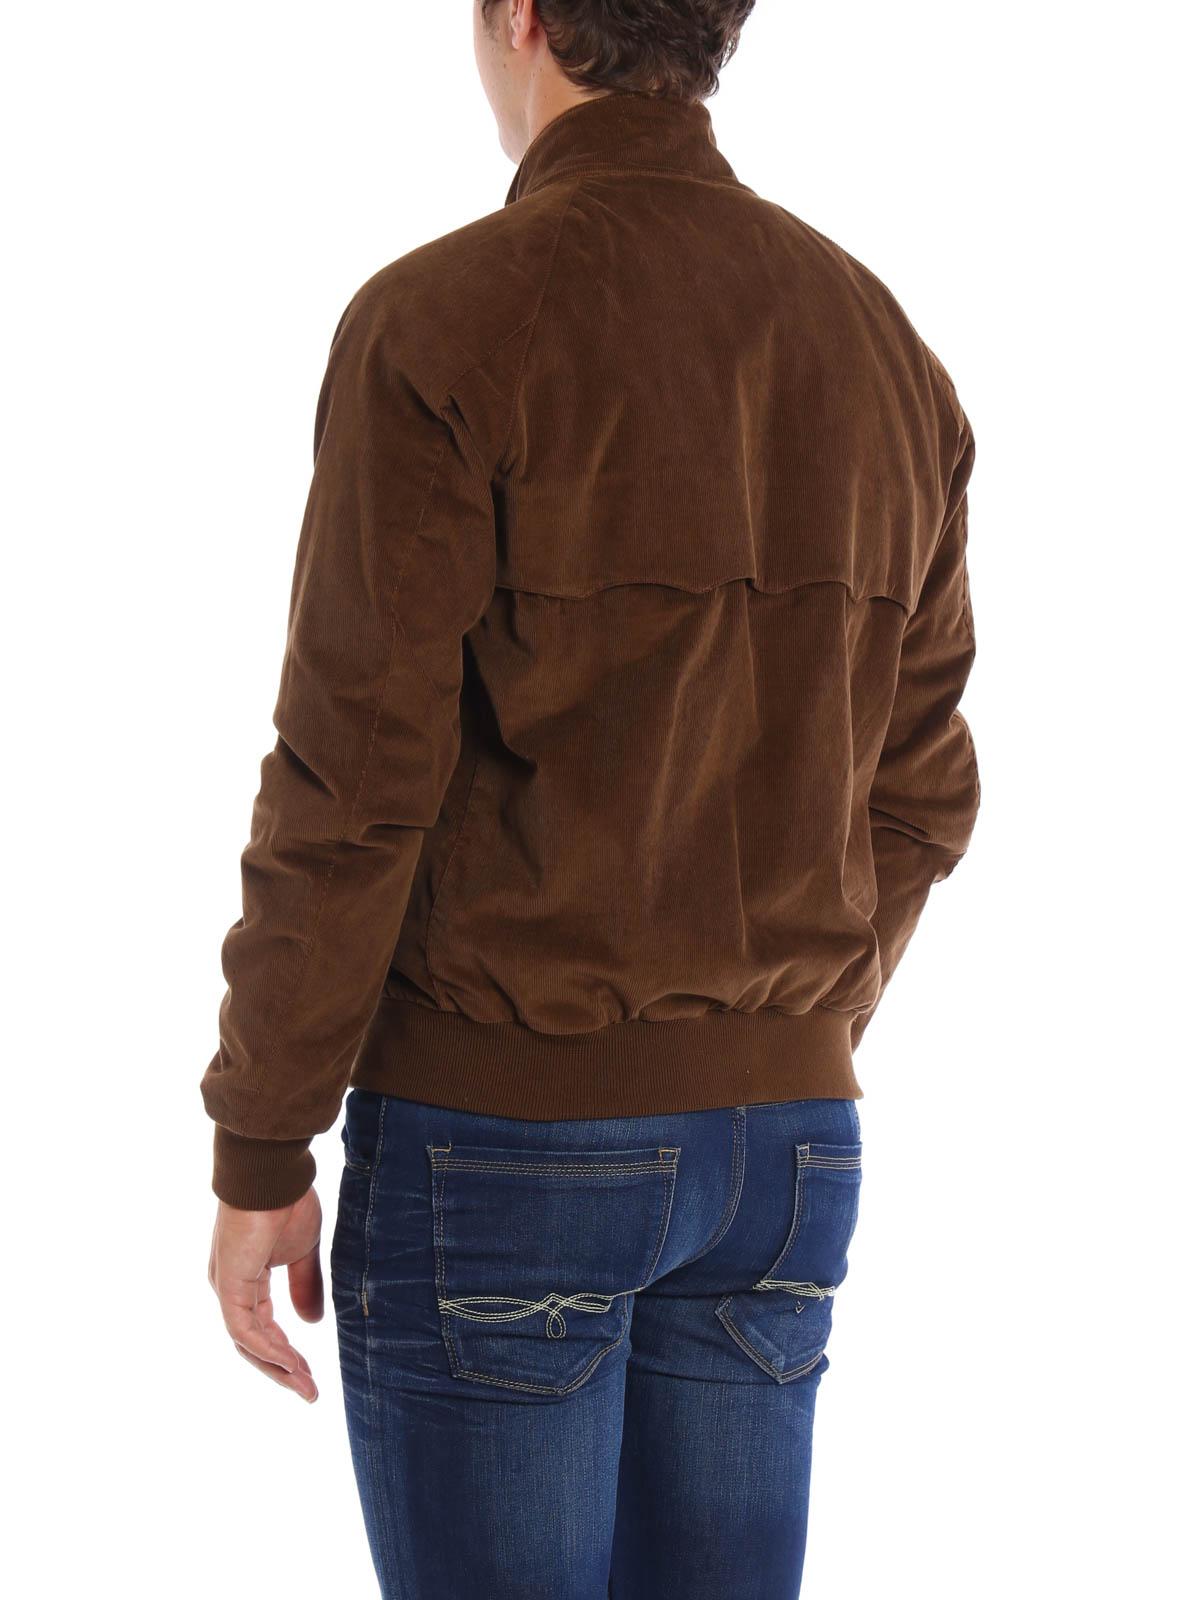 iKRIX BARACUTA  bombers - G9 corduroy Harrington jacket 6f2775f27f